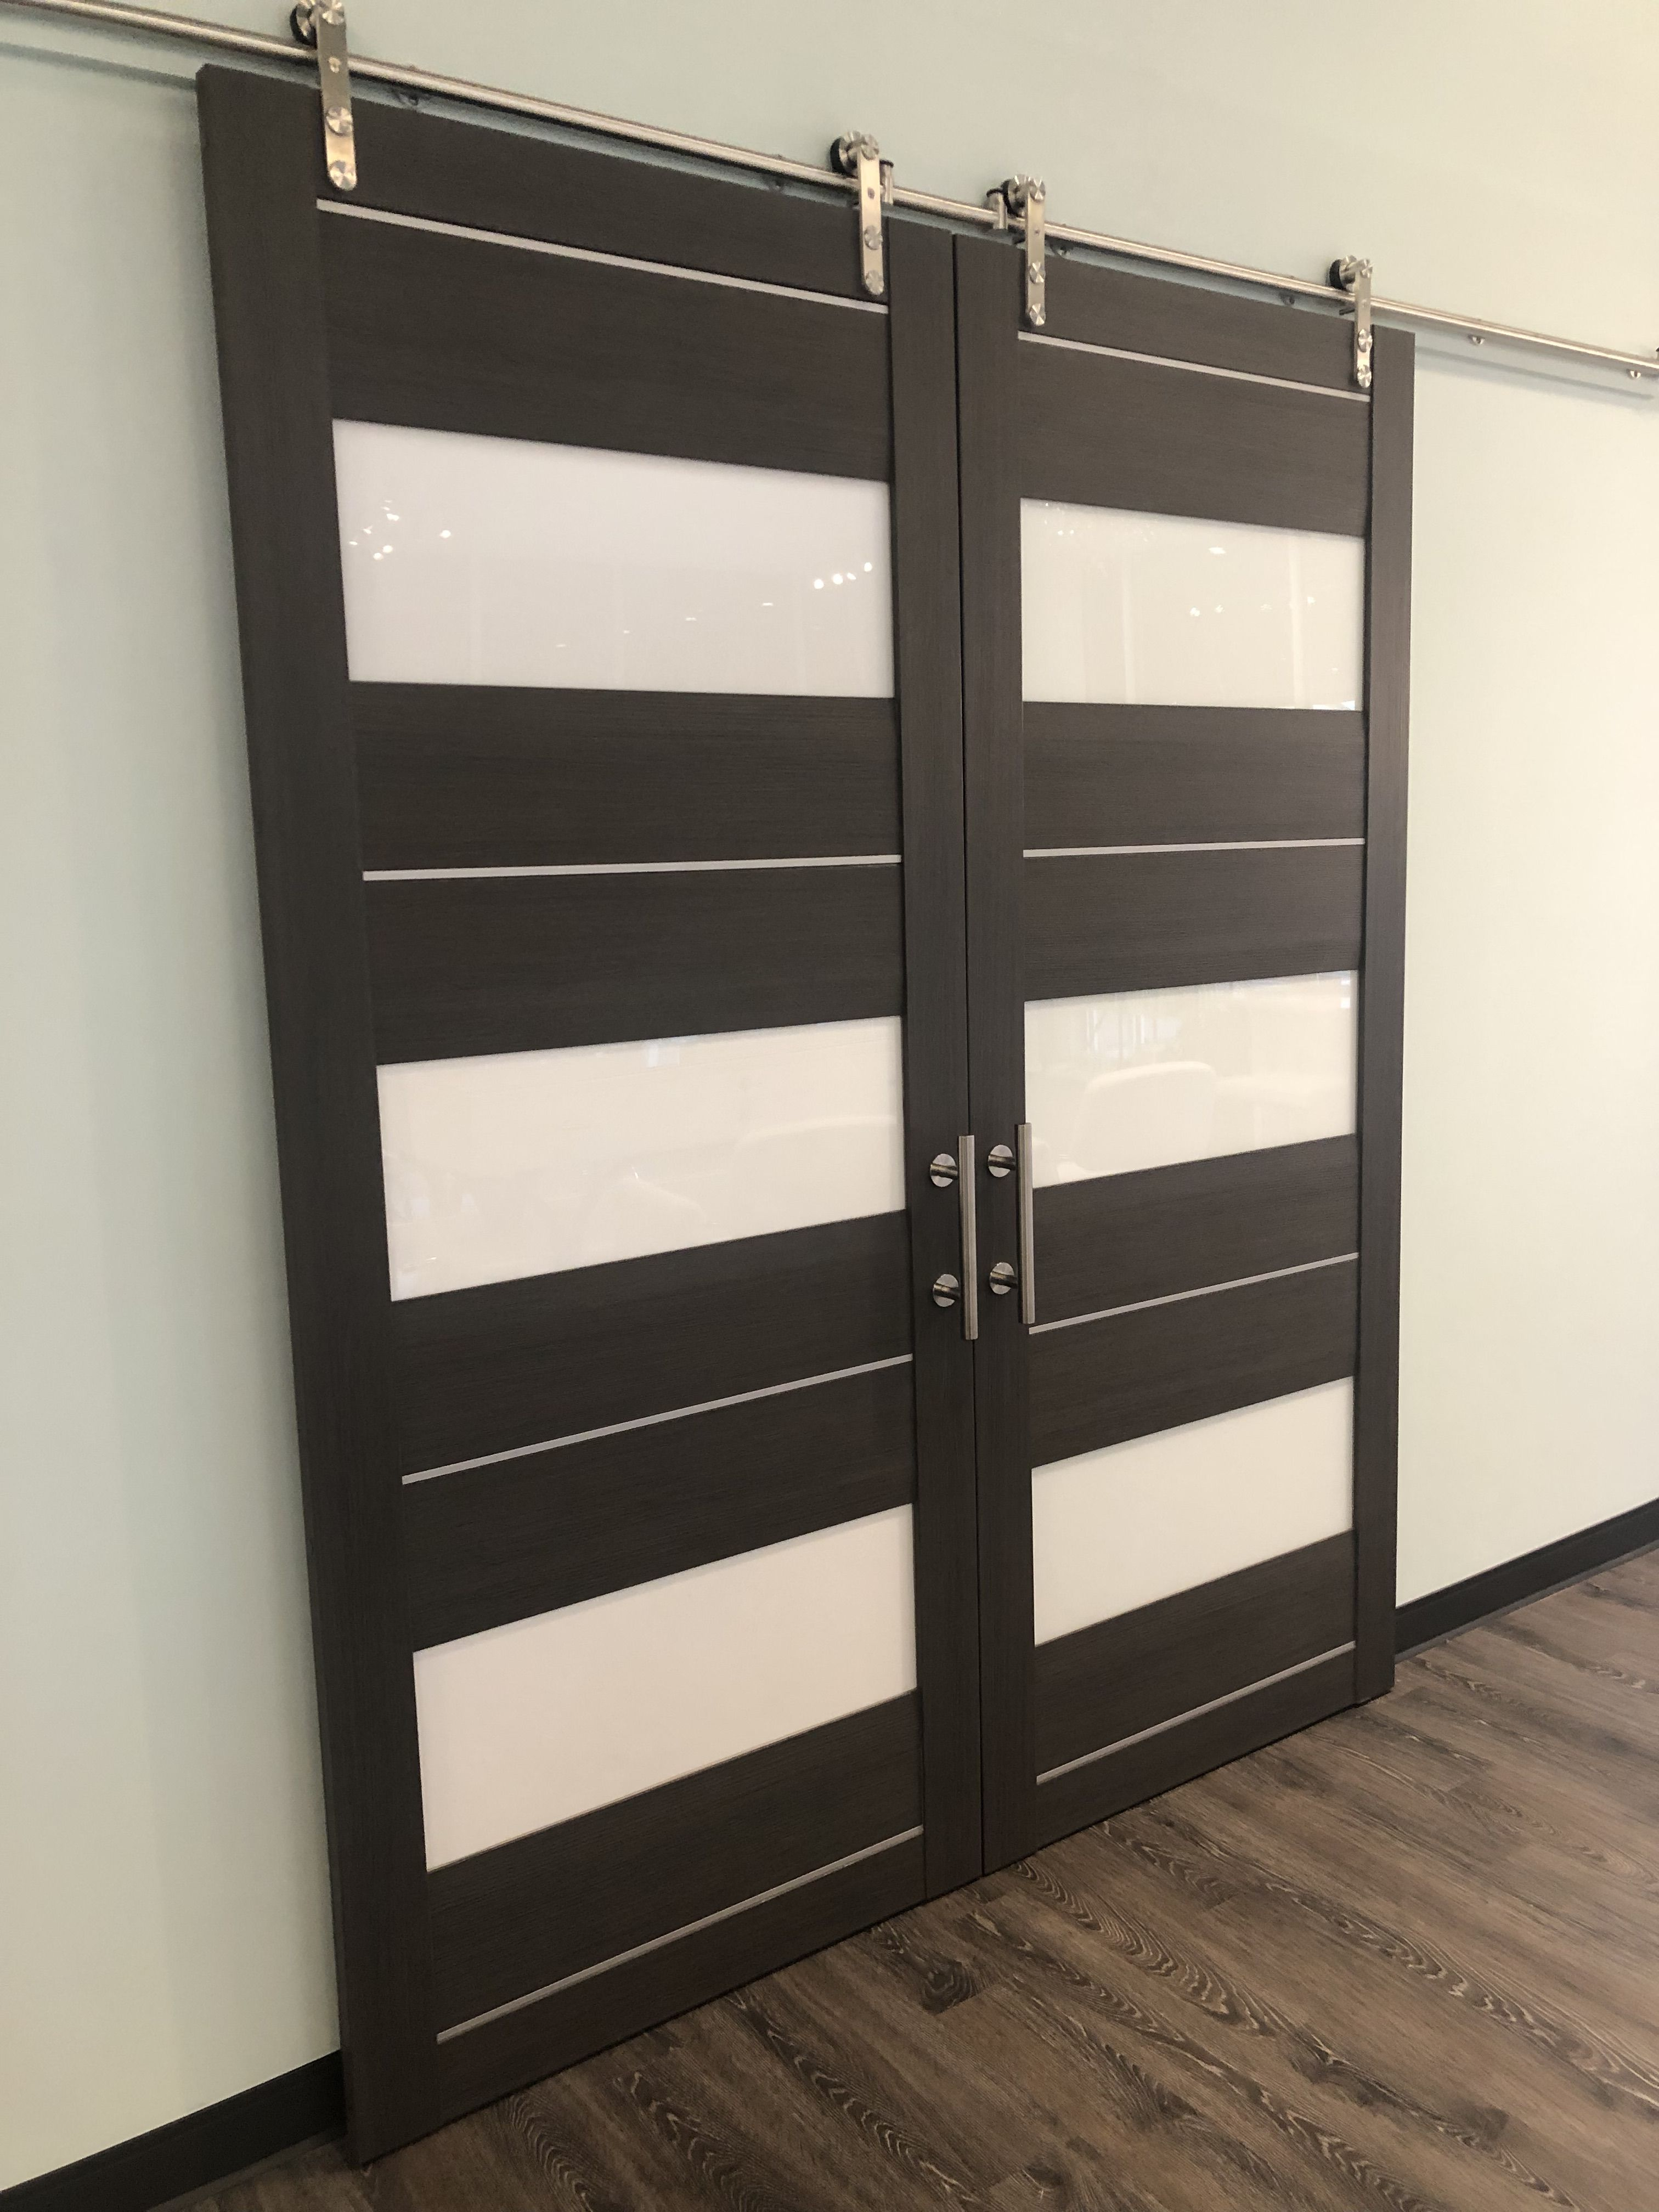 Milano 41x Wenge Melinga Interior Door Buy Home Interior Door At Best Selling Price Doors Interior French Doors French Doors Interior